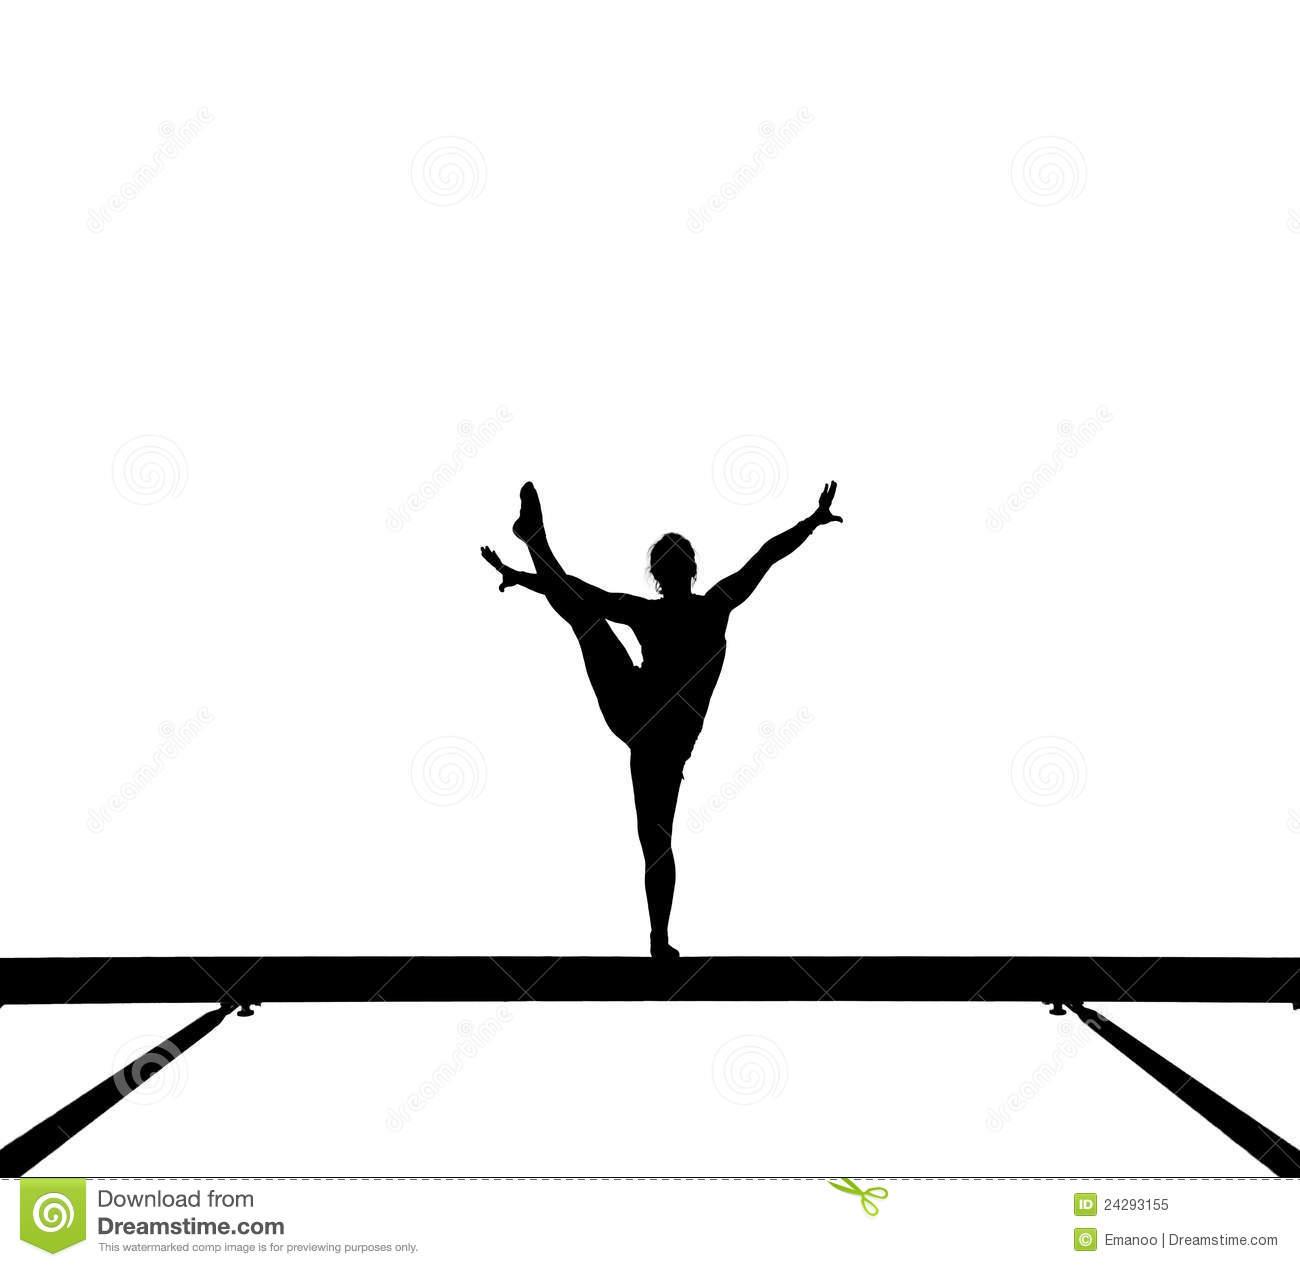 Gymnastics clipart balance beam Clipart Panda Clipart gymnastics%20clipart%20silhouette Gymnastics